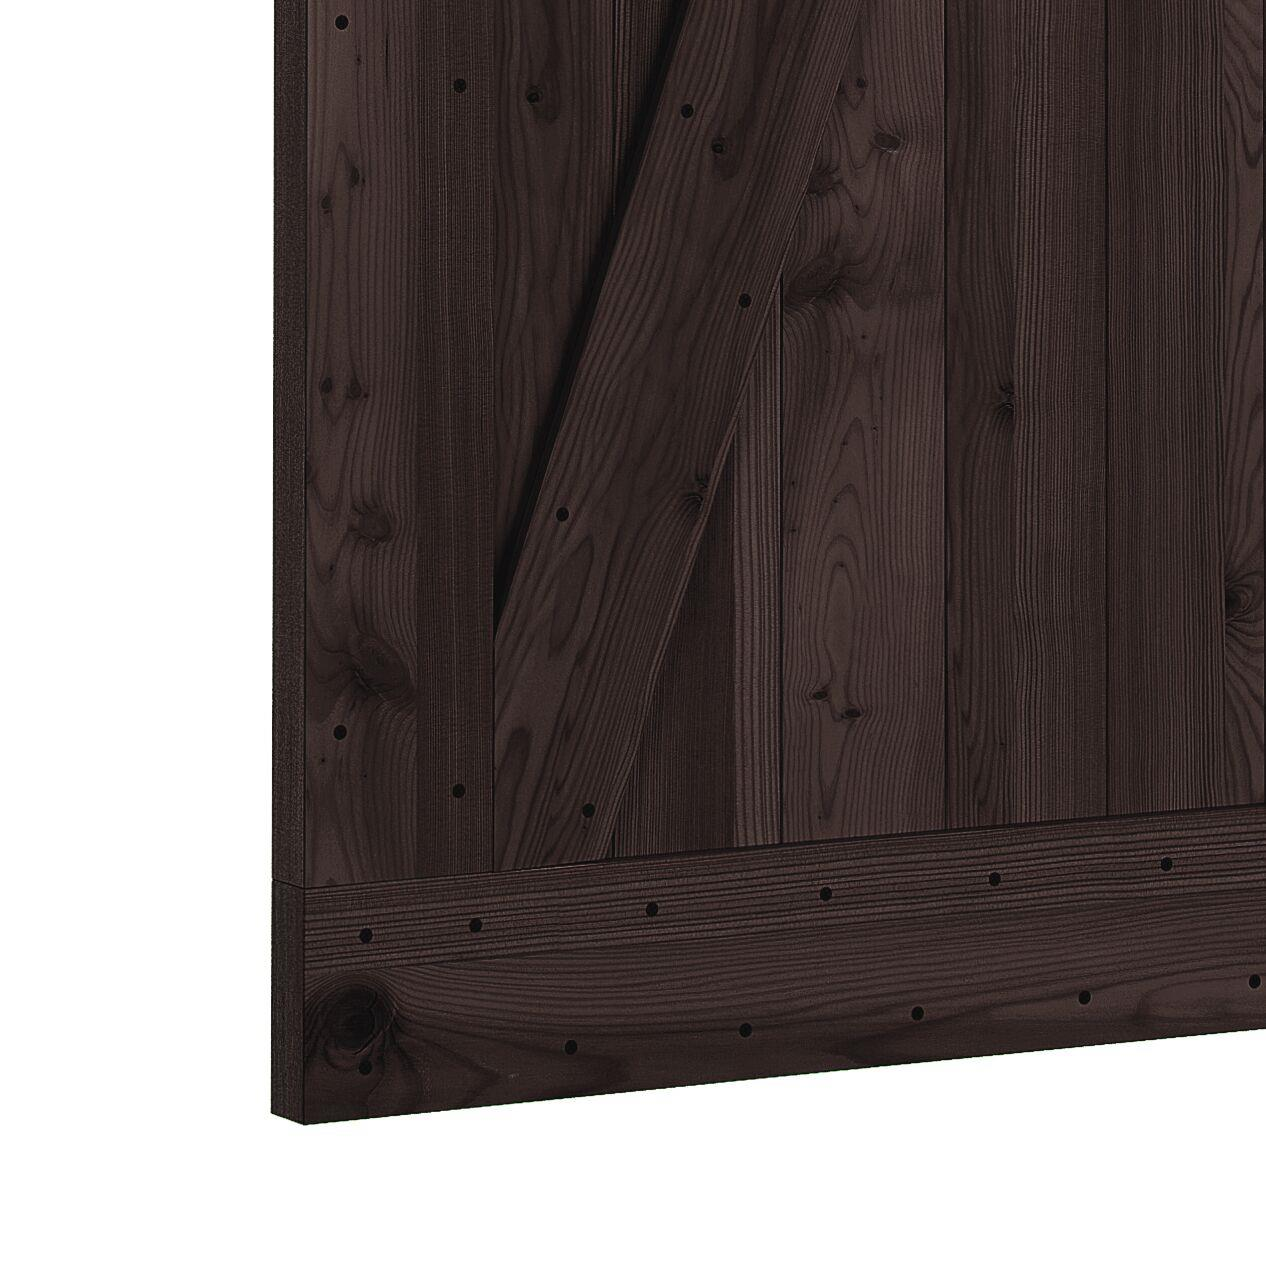 Northbeam Paneled Wood Finish Prehung Barn Door With